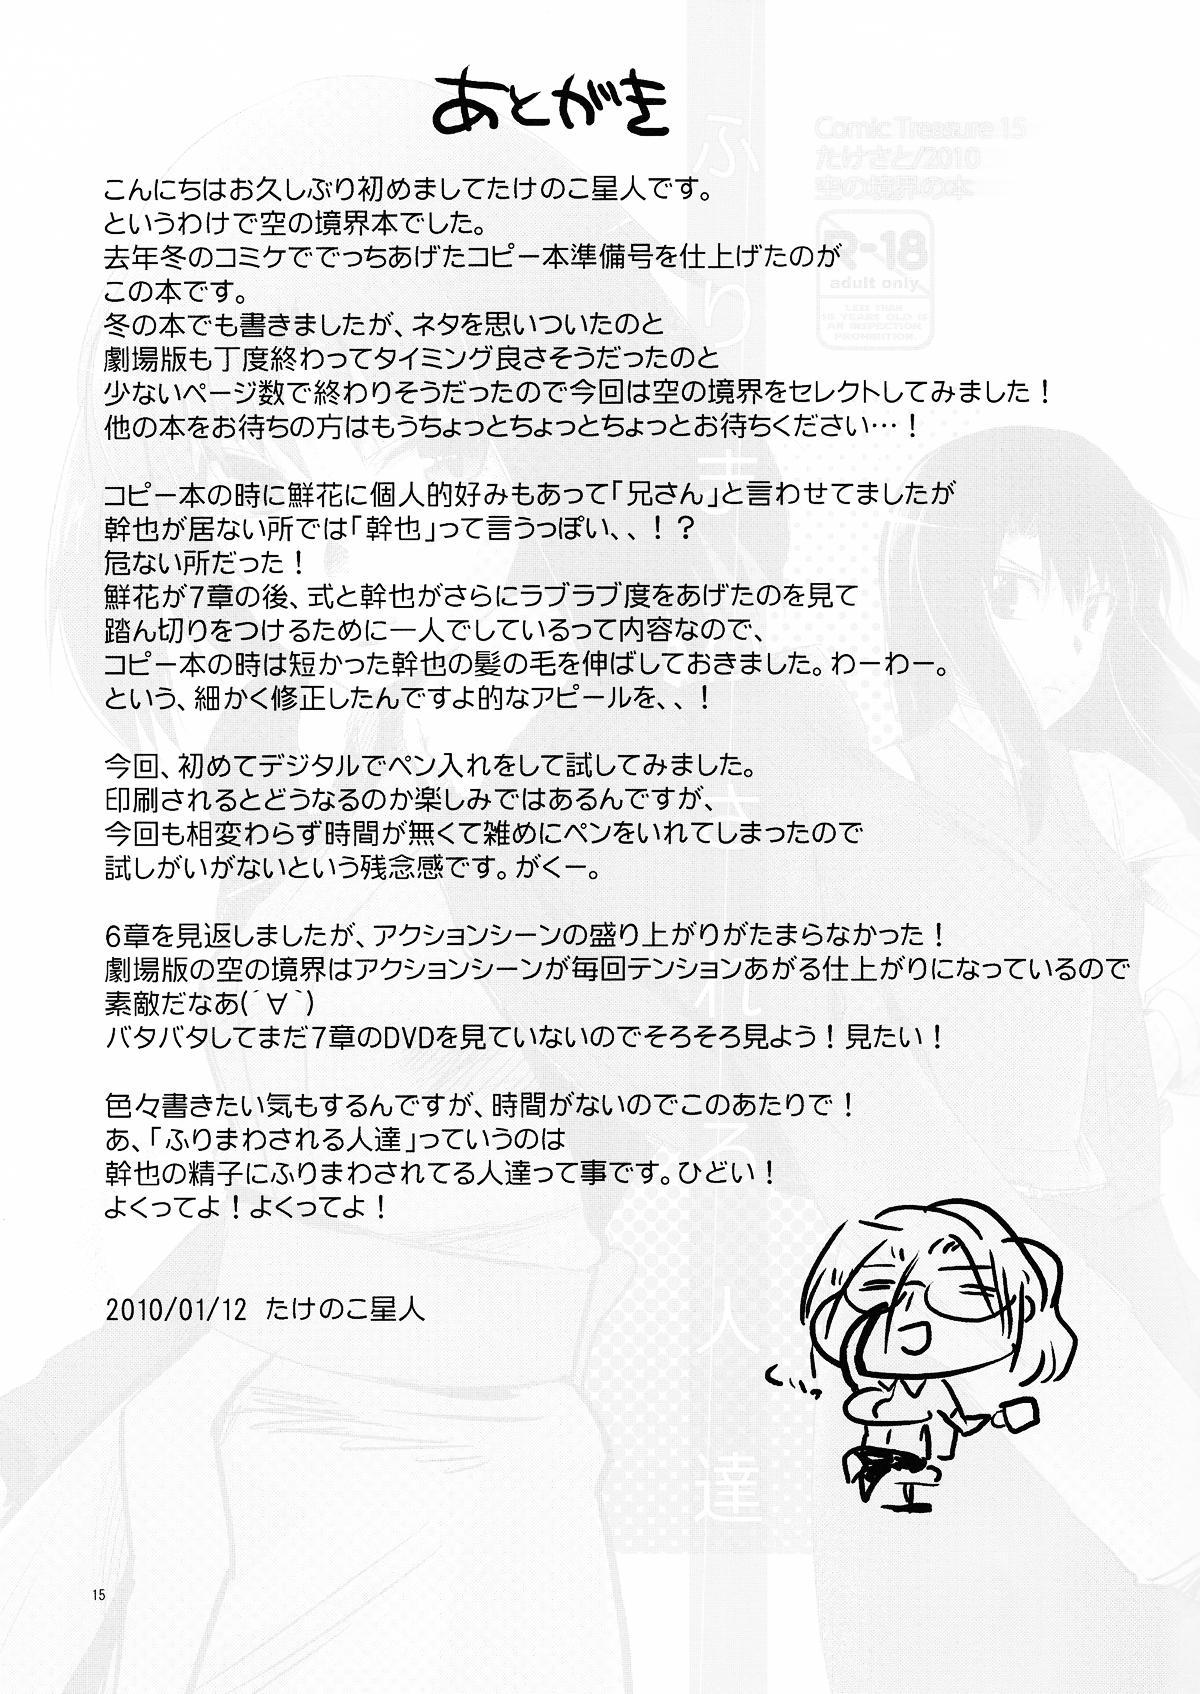 Furimawasareru Hitotachi 14